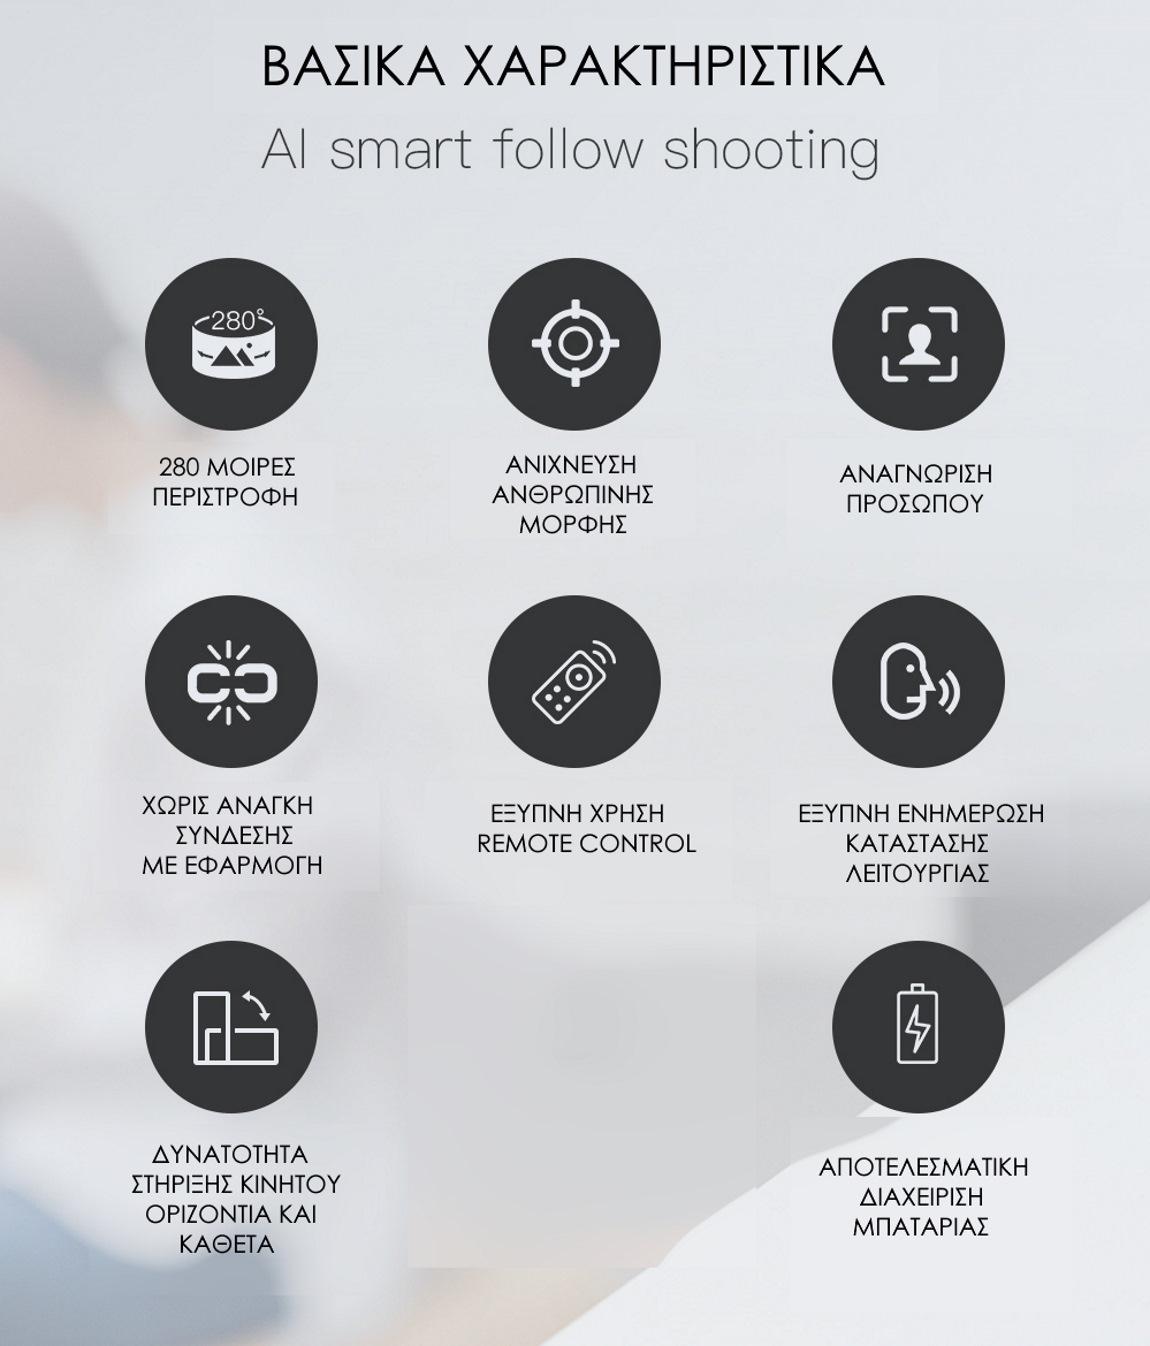 AI Smart Follow Shooting βασικά χαρακτηριστικά